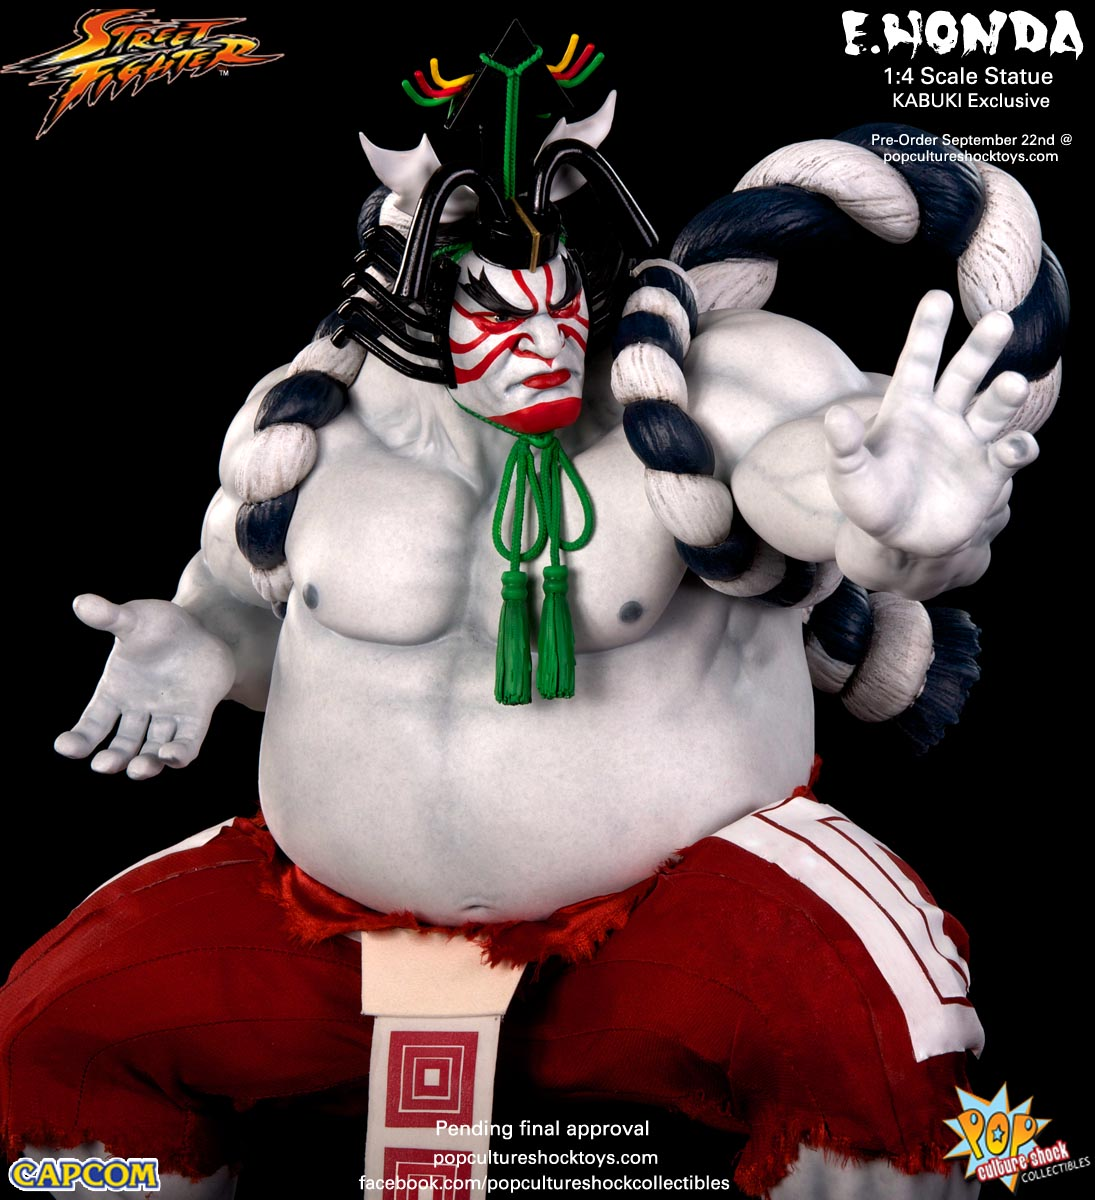 [Pop Culture Shock] Street Fighter: E. Honda 1/4 Statue - Página 3 Street-Fighter-E.-Honda-Kabuki-Statue-026